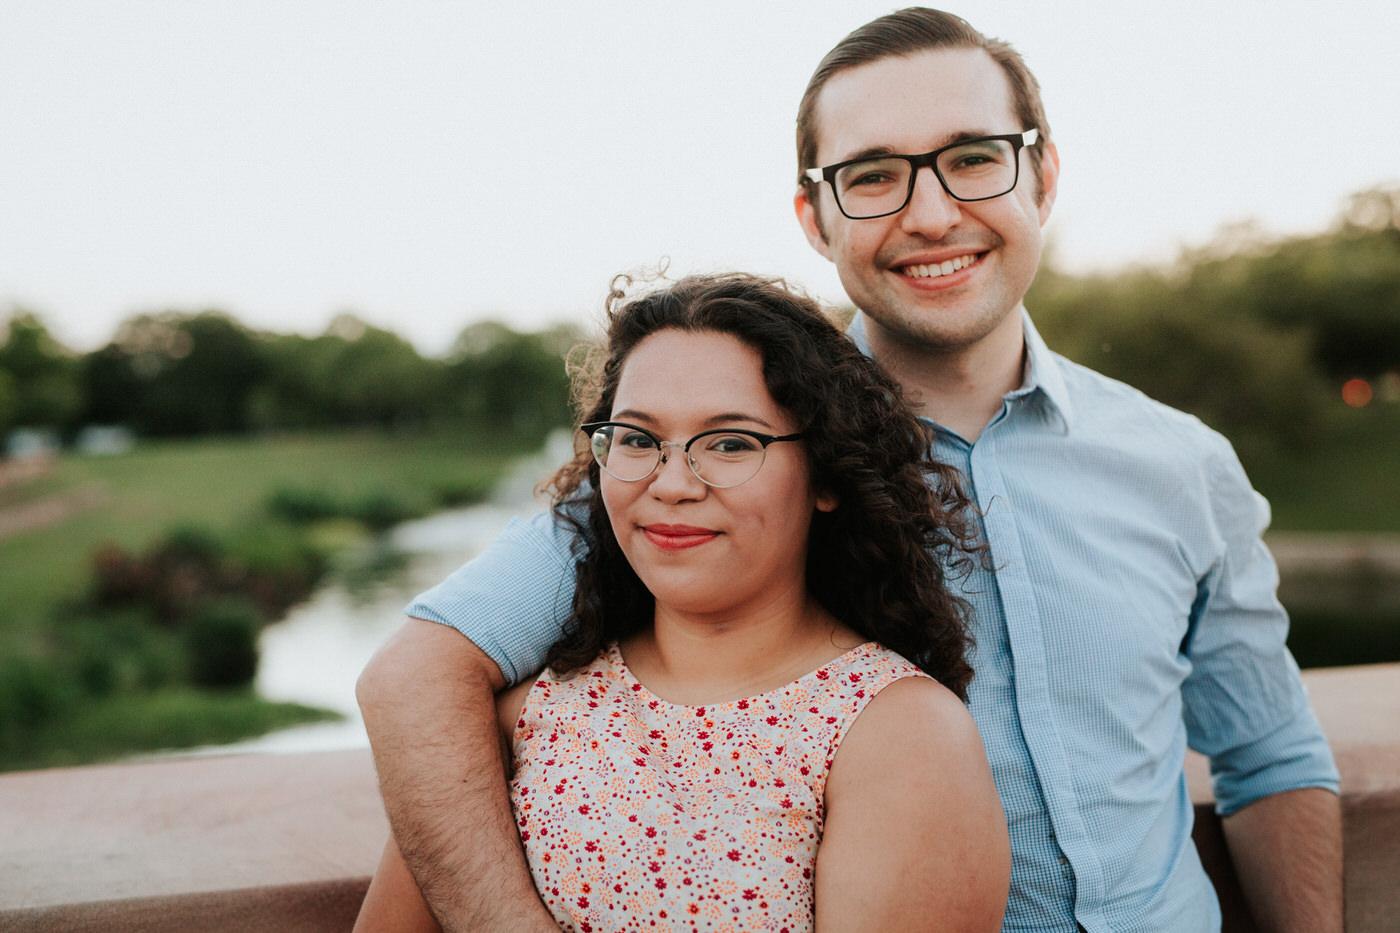 Austin Mueller Park Engagement - Diana Ascarrunz Photography-144.jpg